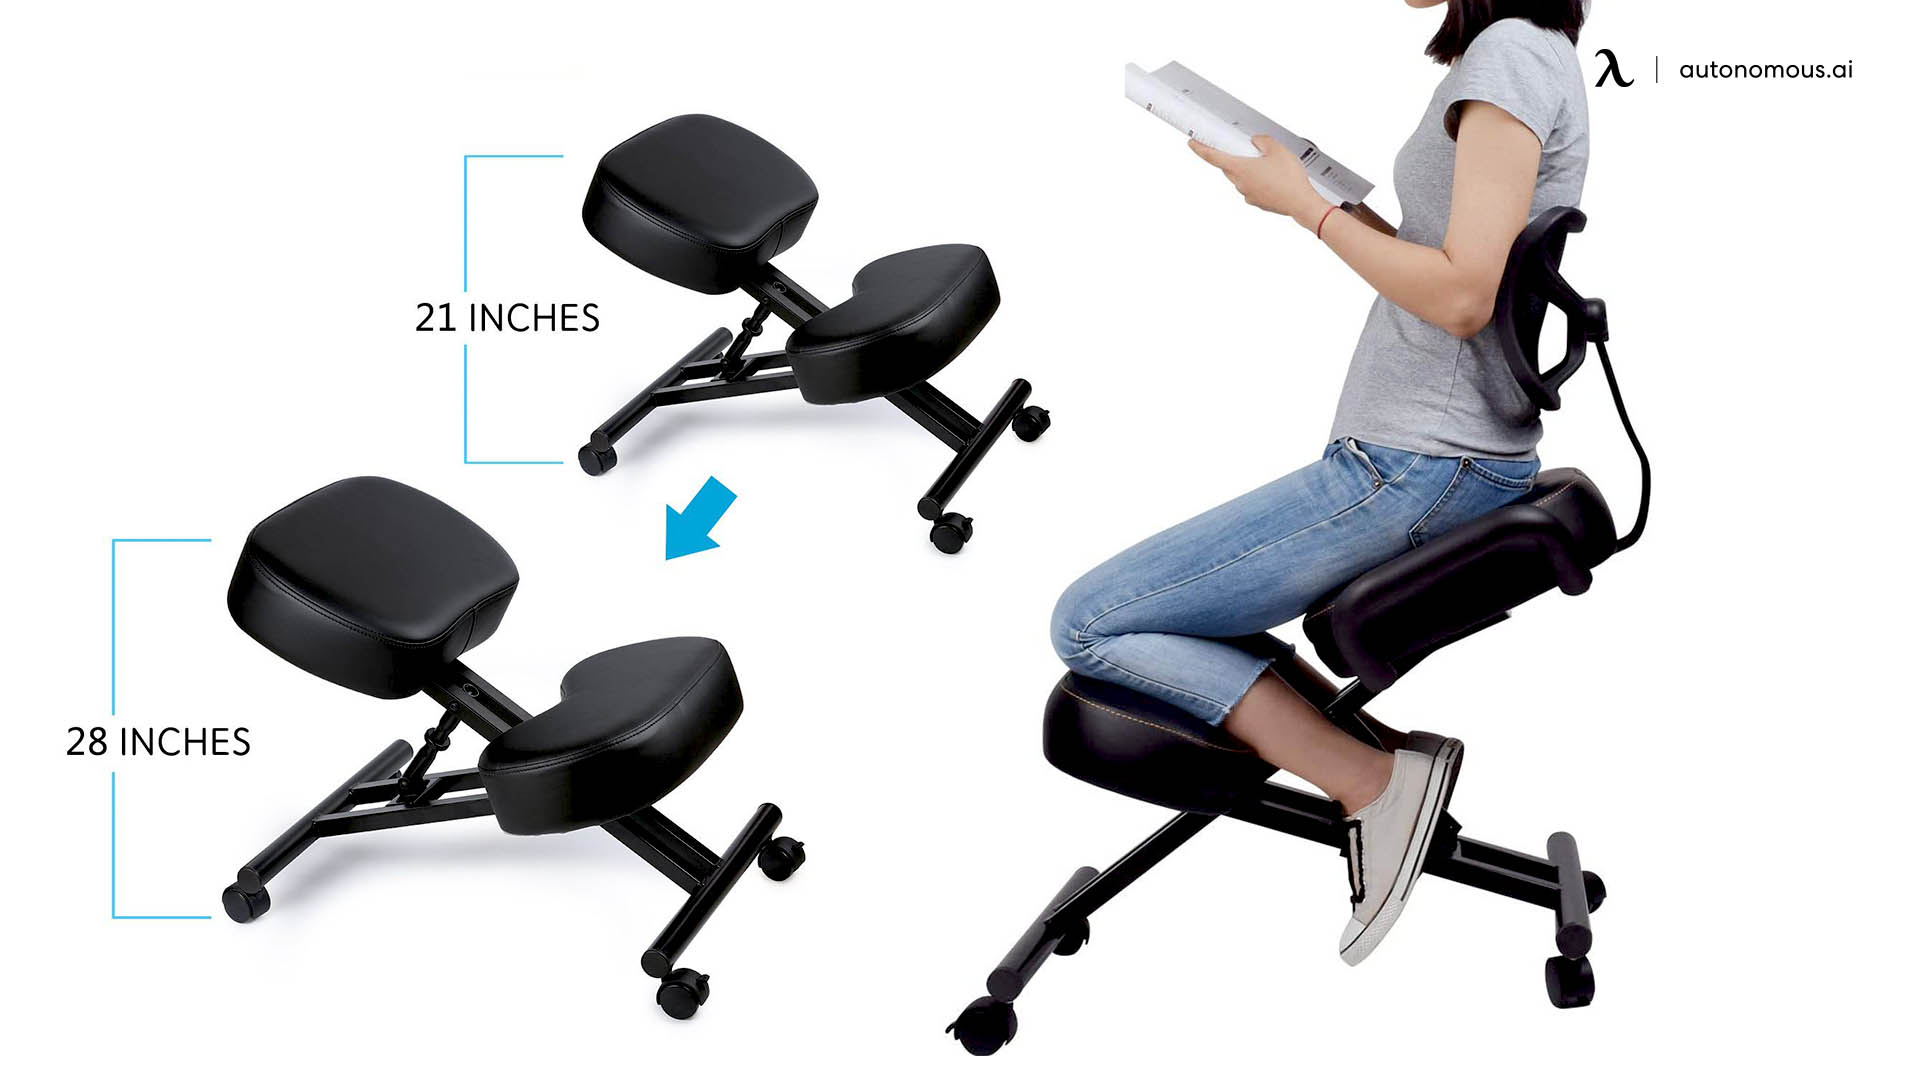 Ergonomic Kneeling Chair by Dragonn